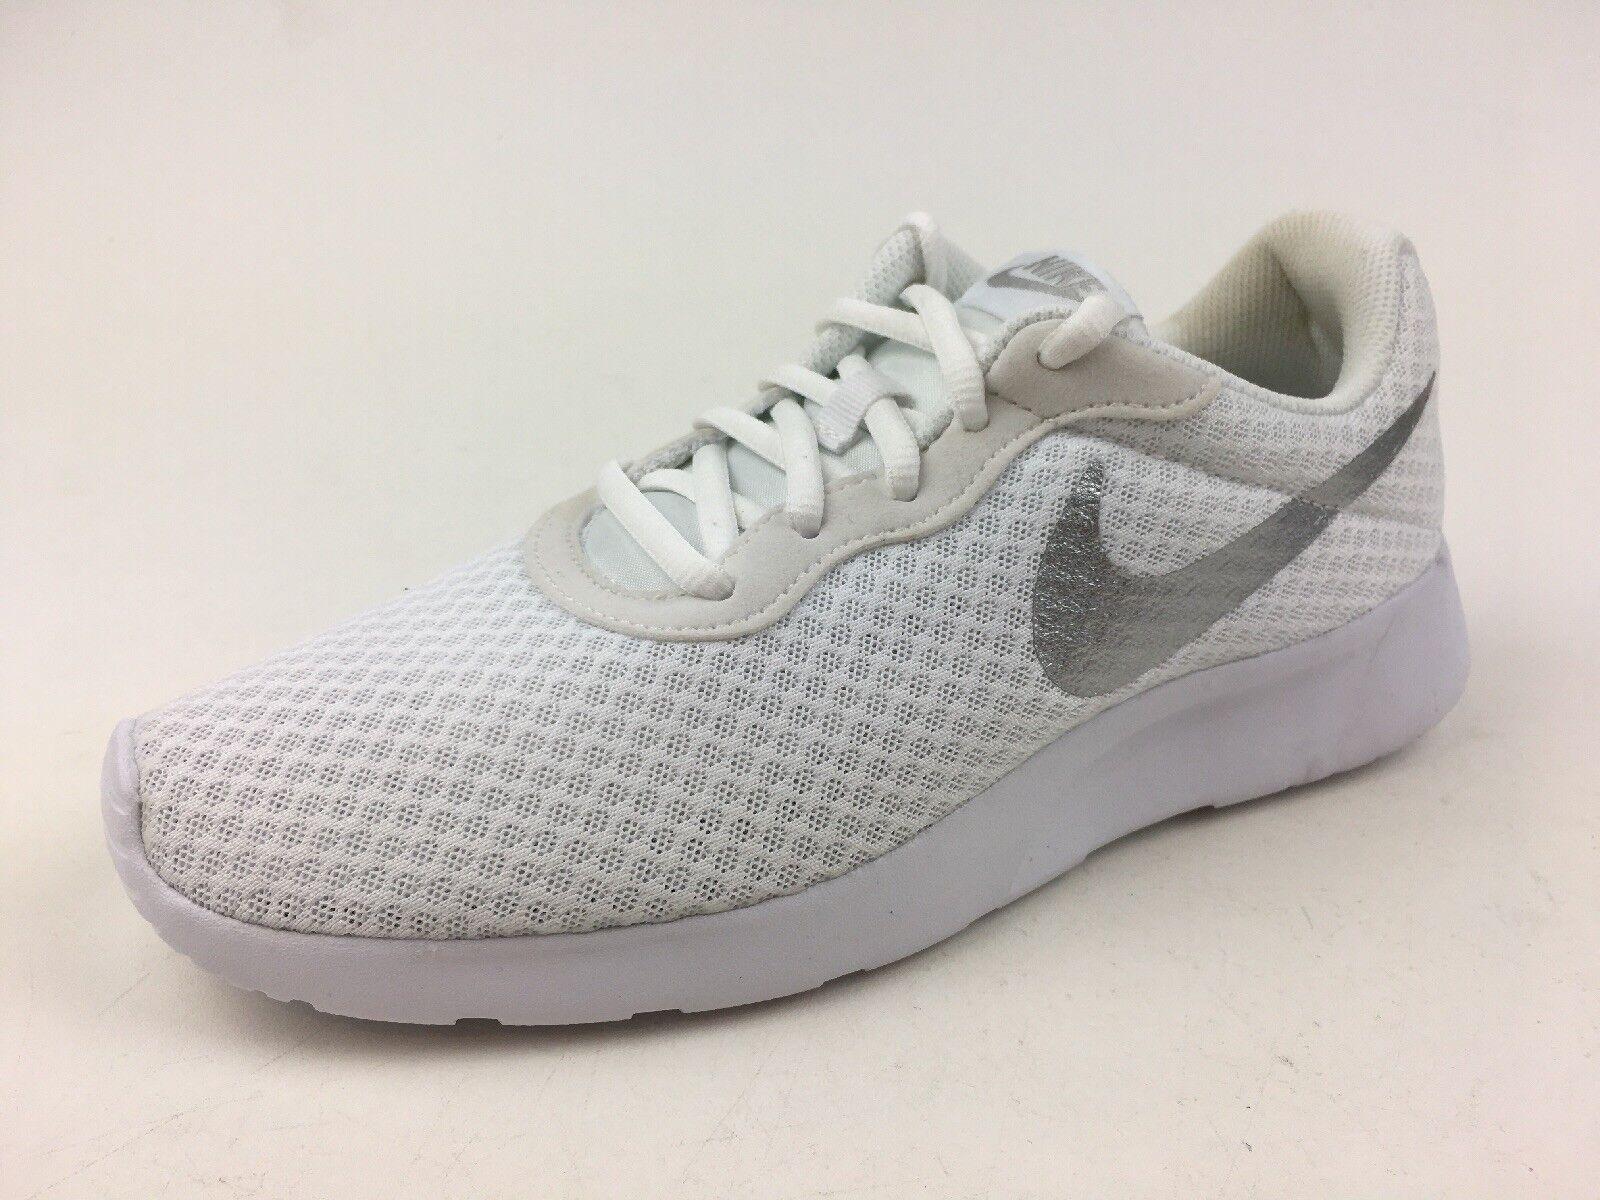 Women's Nike Tanjun White Athletic Sneakers Size 8.5  161